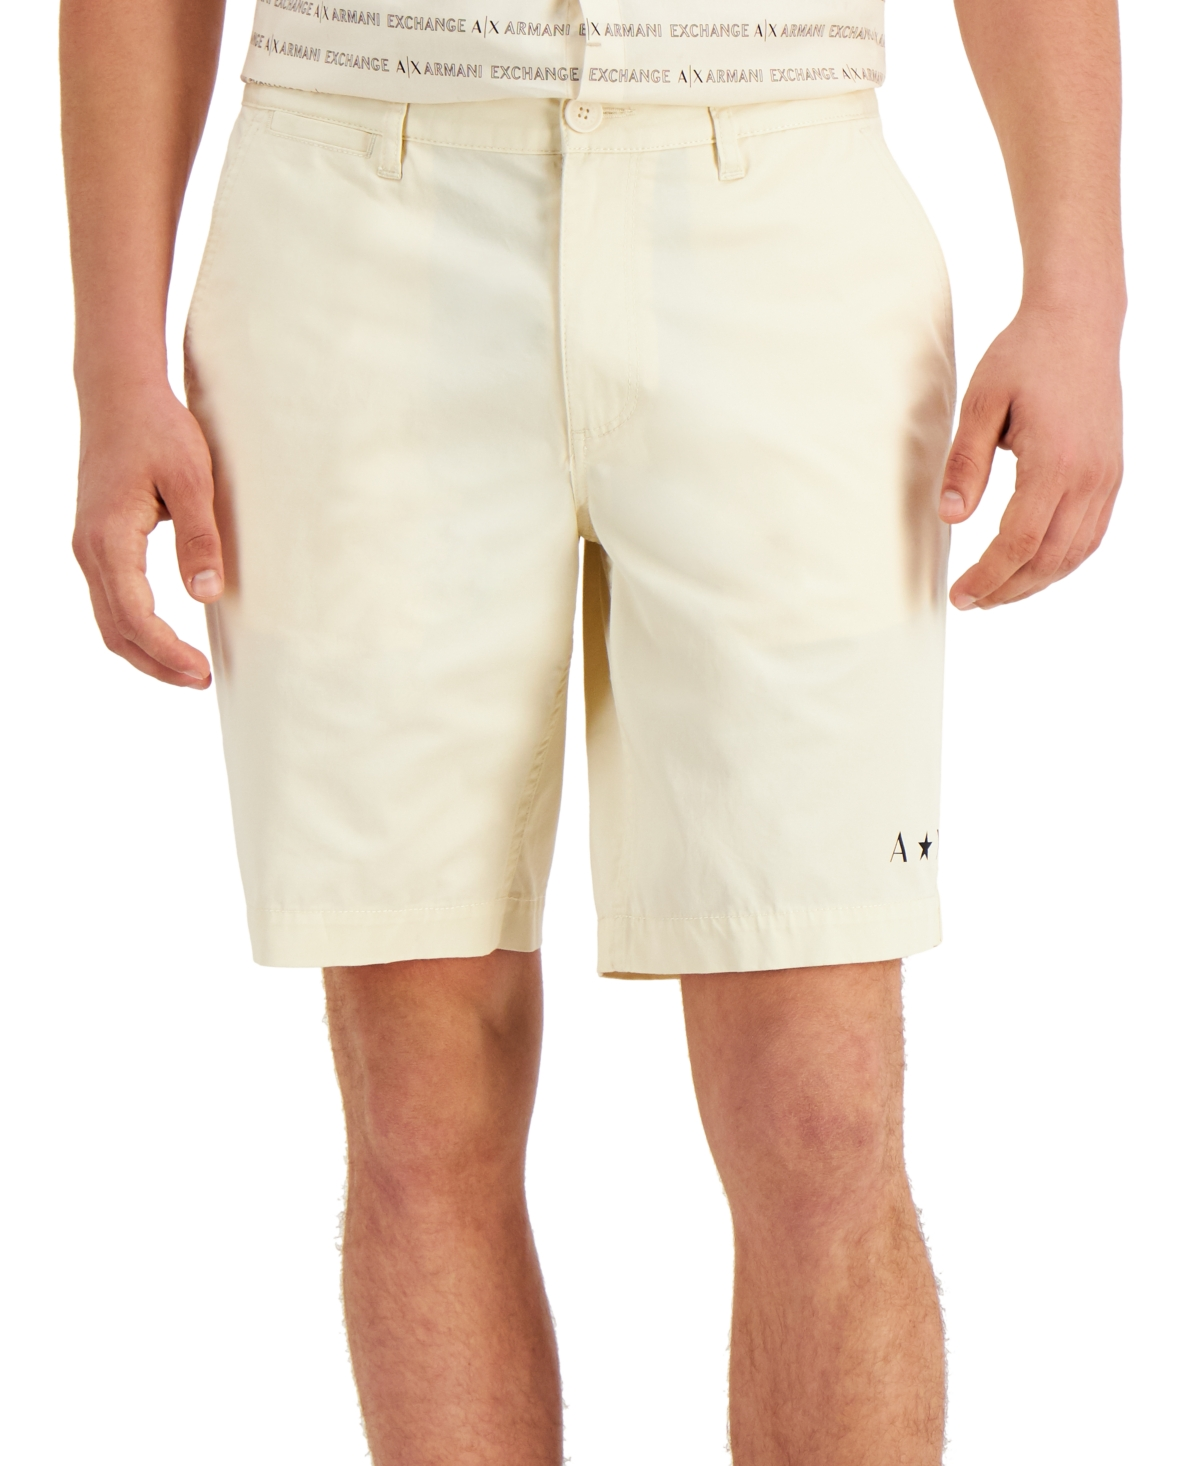 18914098 fpx - Men Fashion